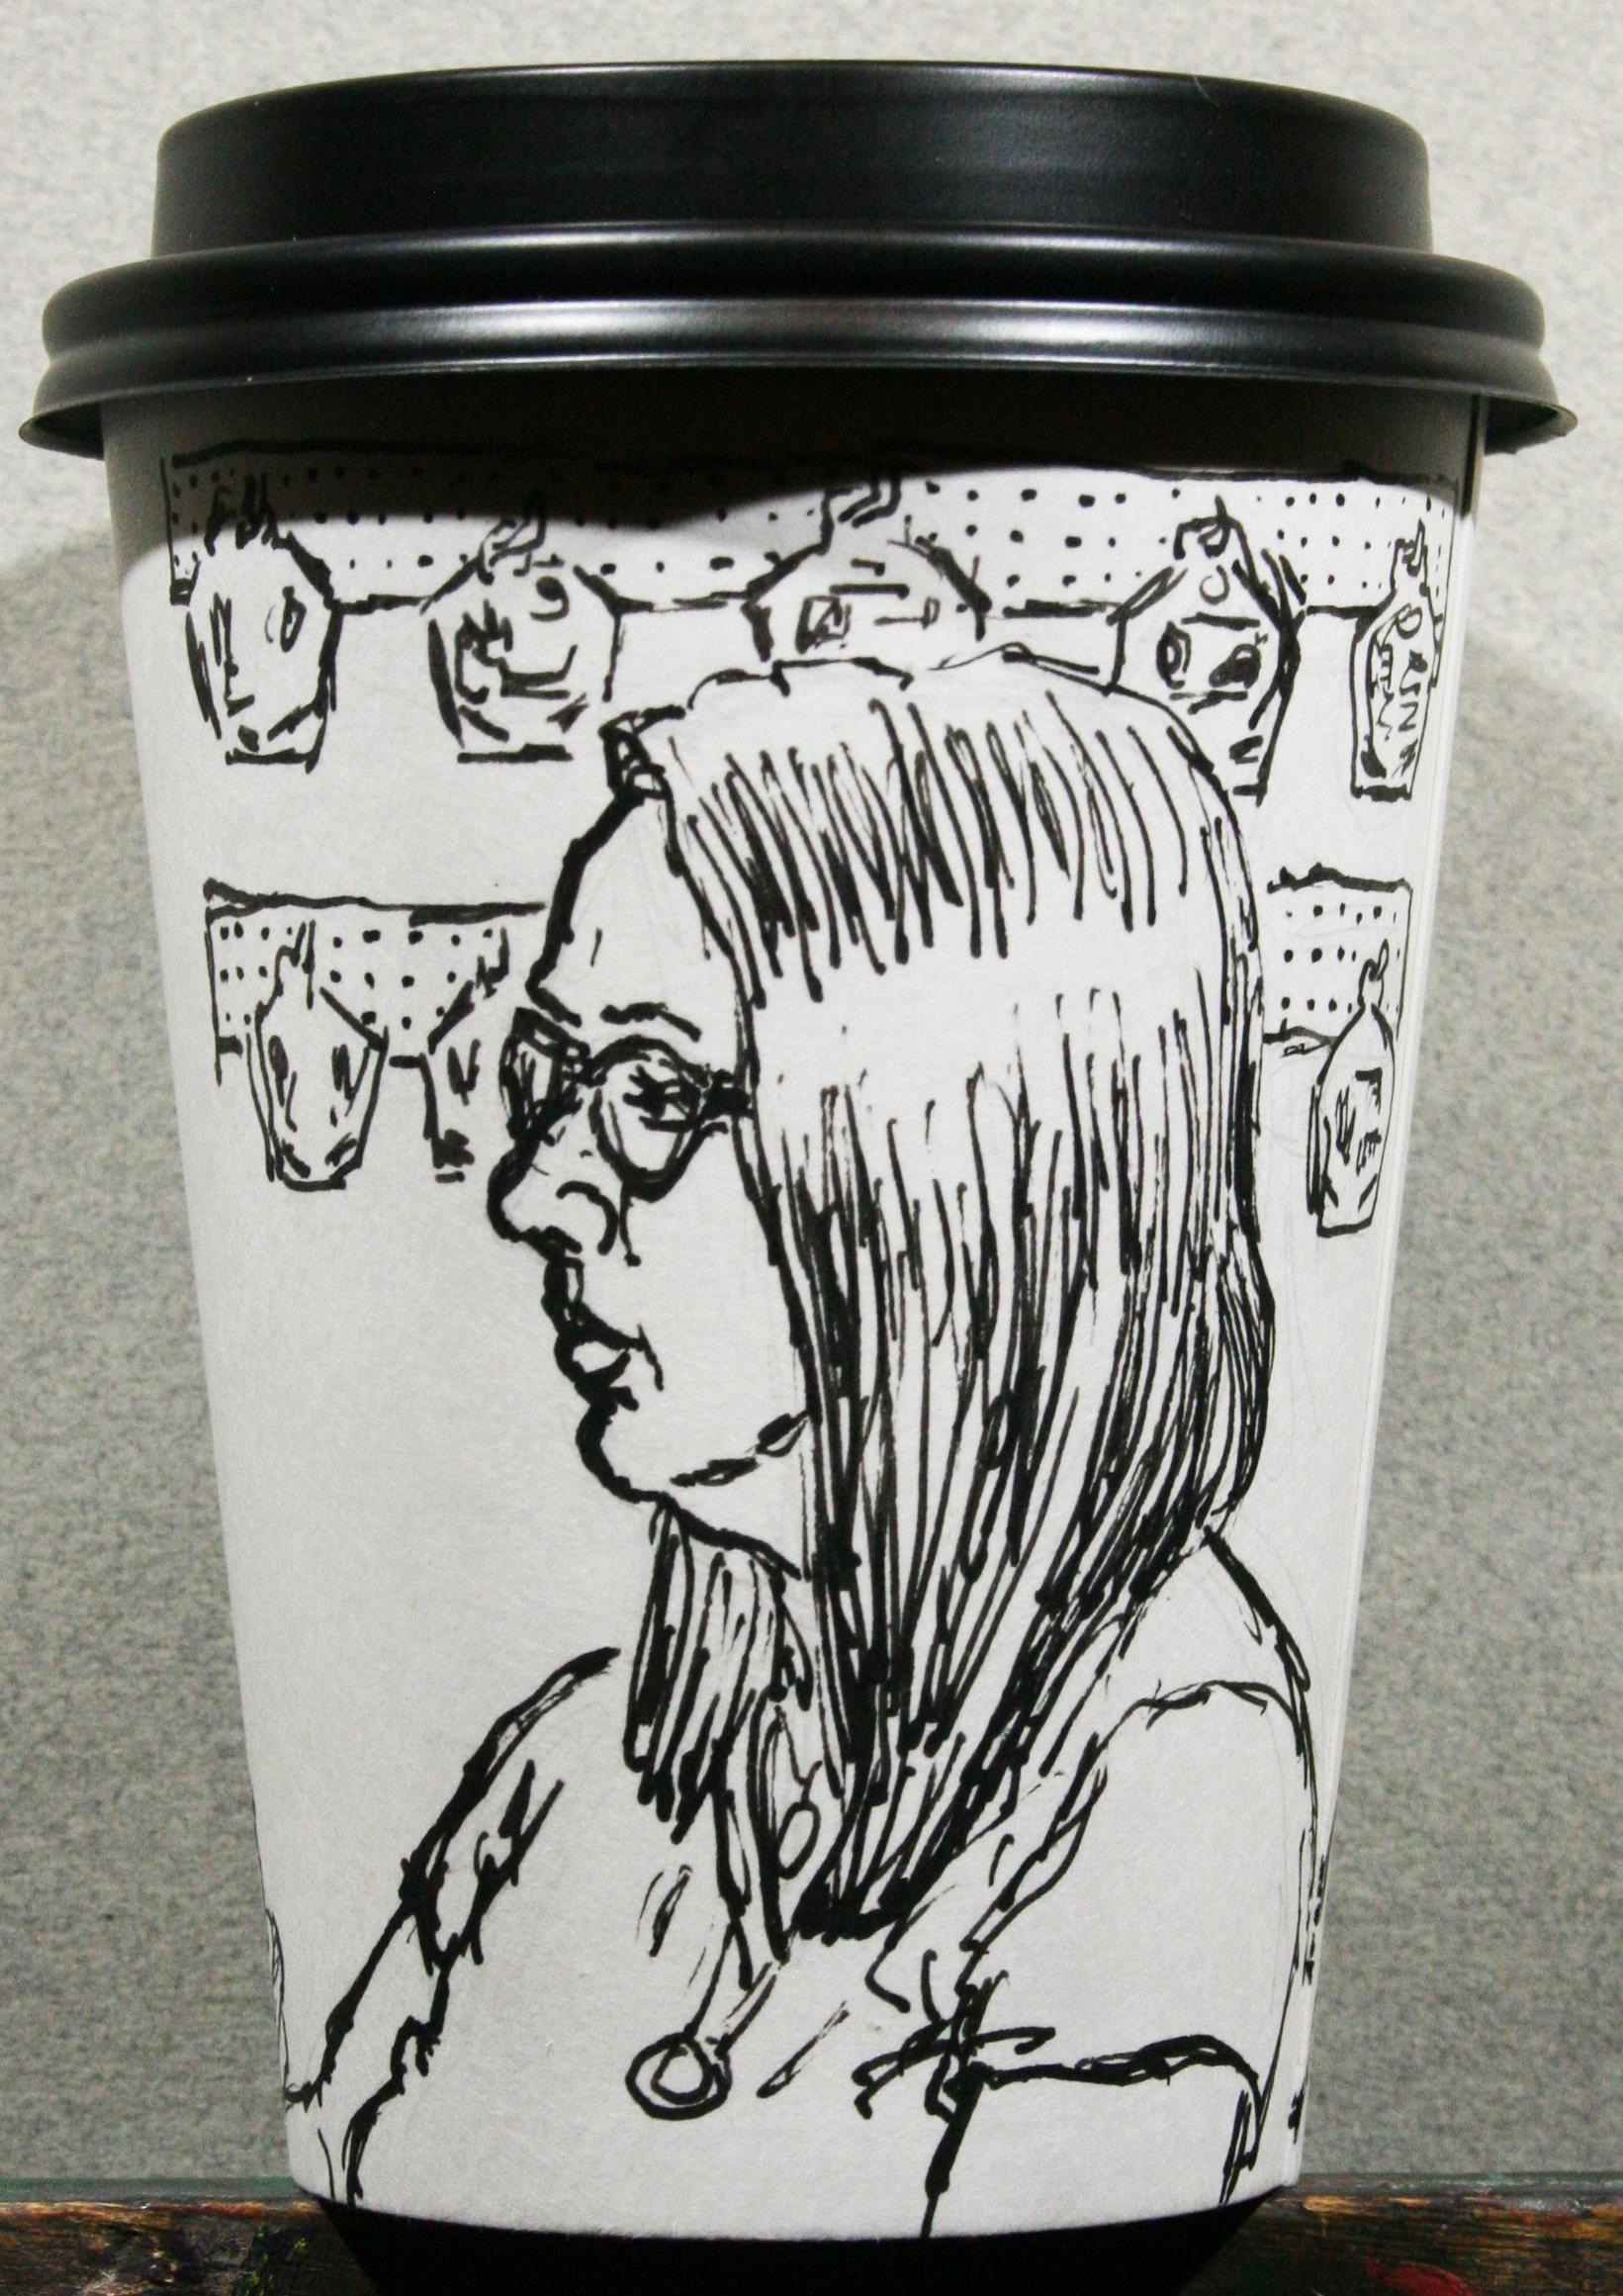 Jack Flotte did this half hour coffee cup portrait.